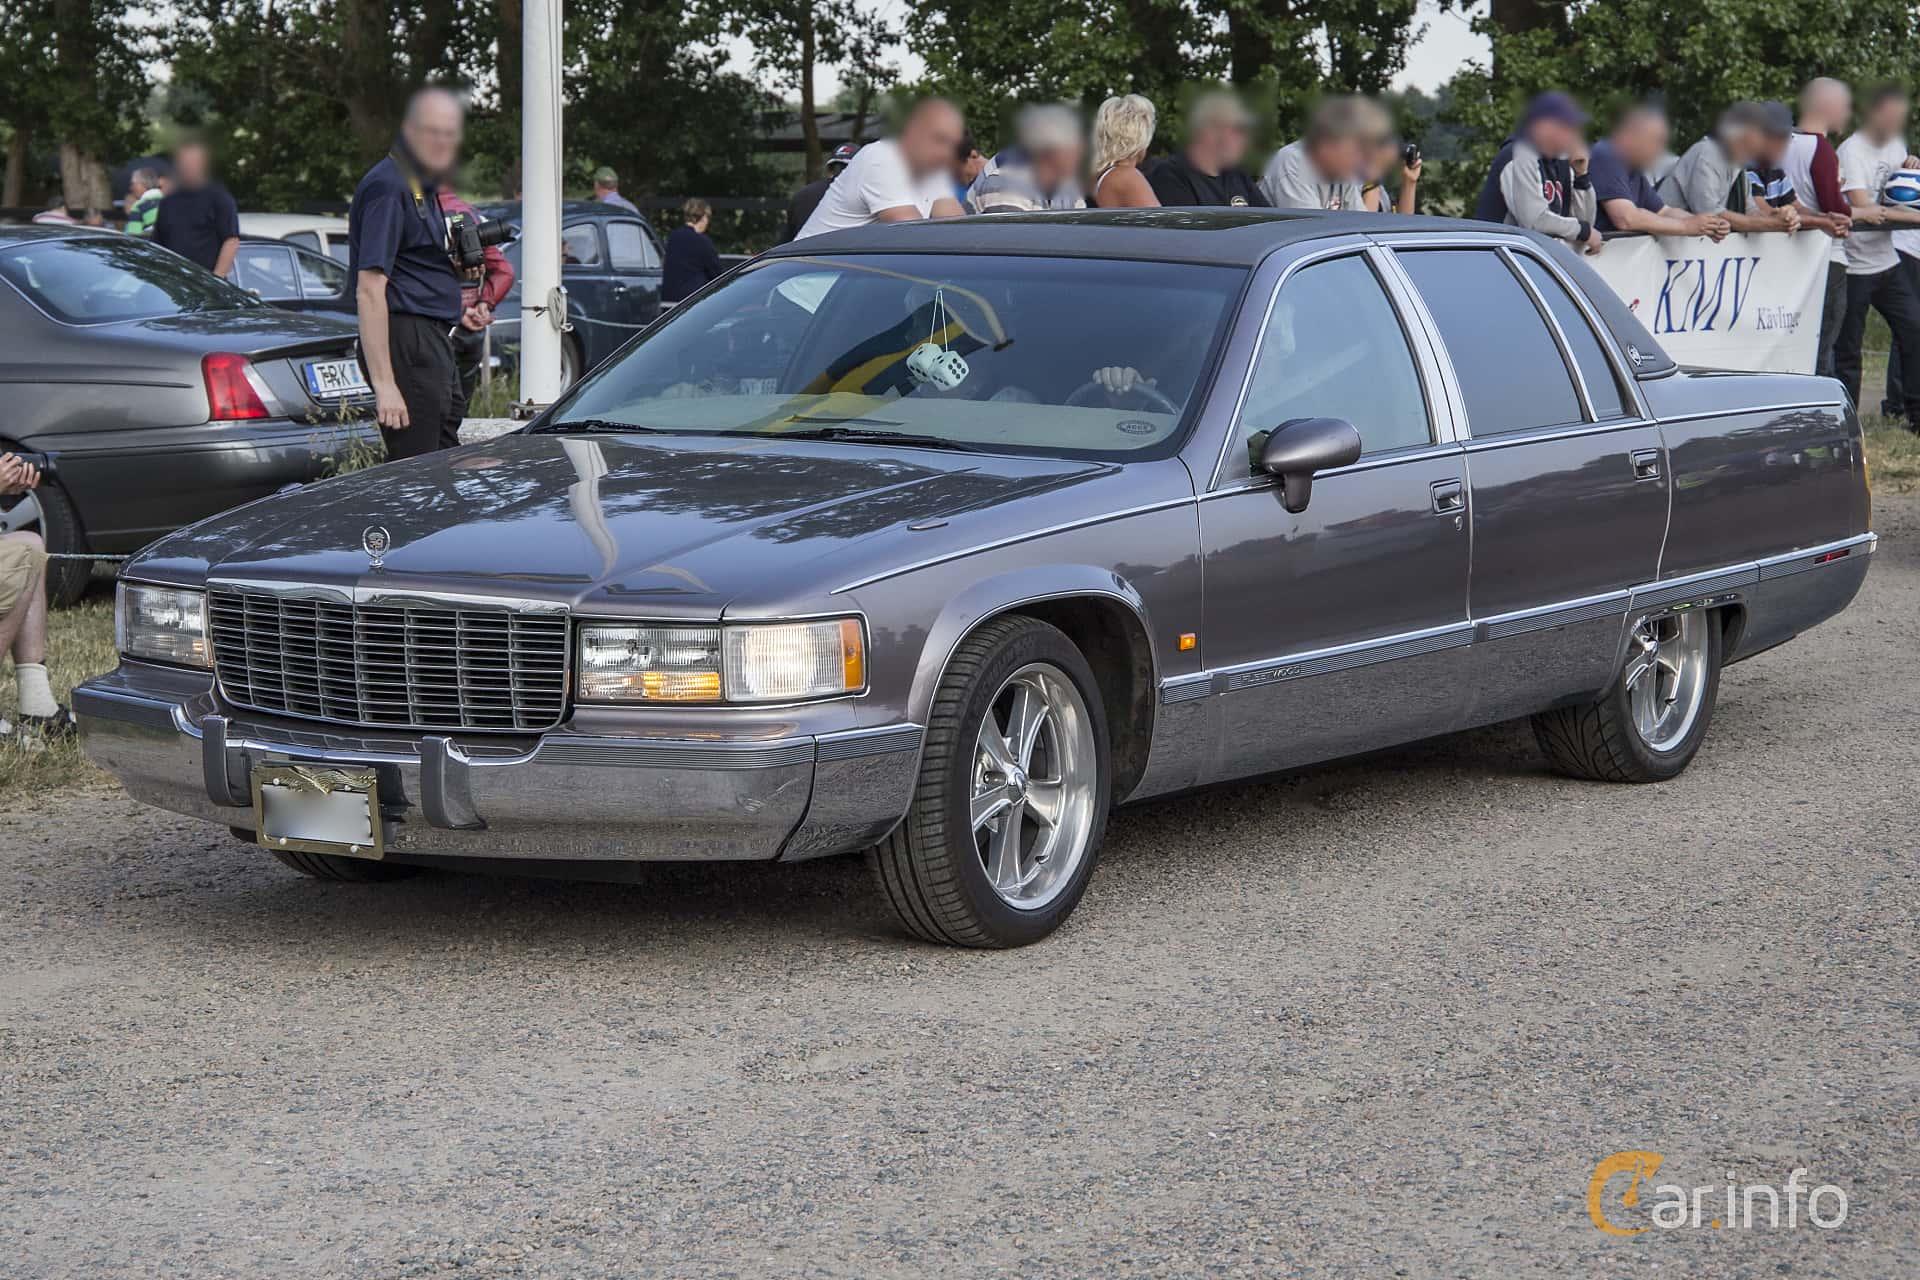 Cadillac Fleetwood 3rd Generation